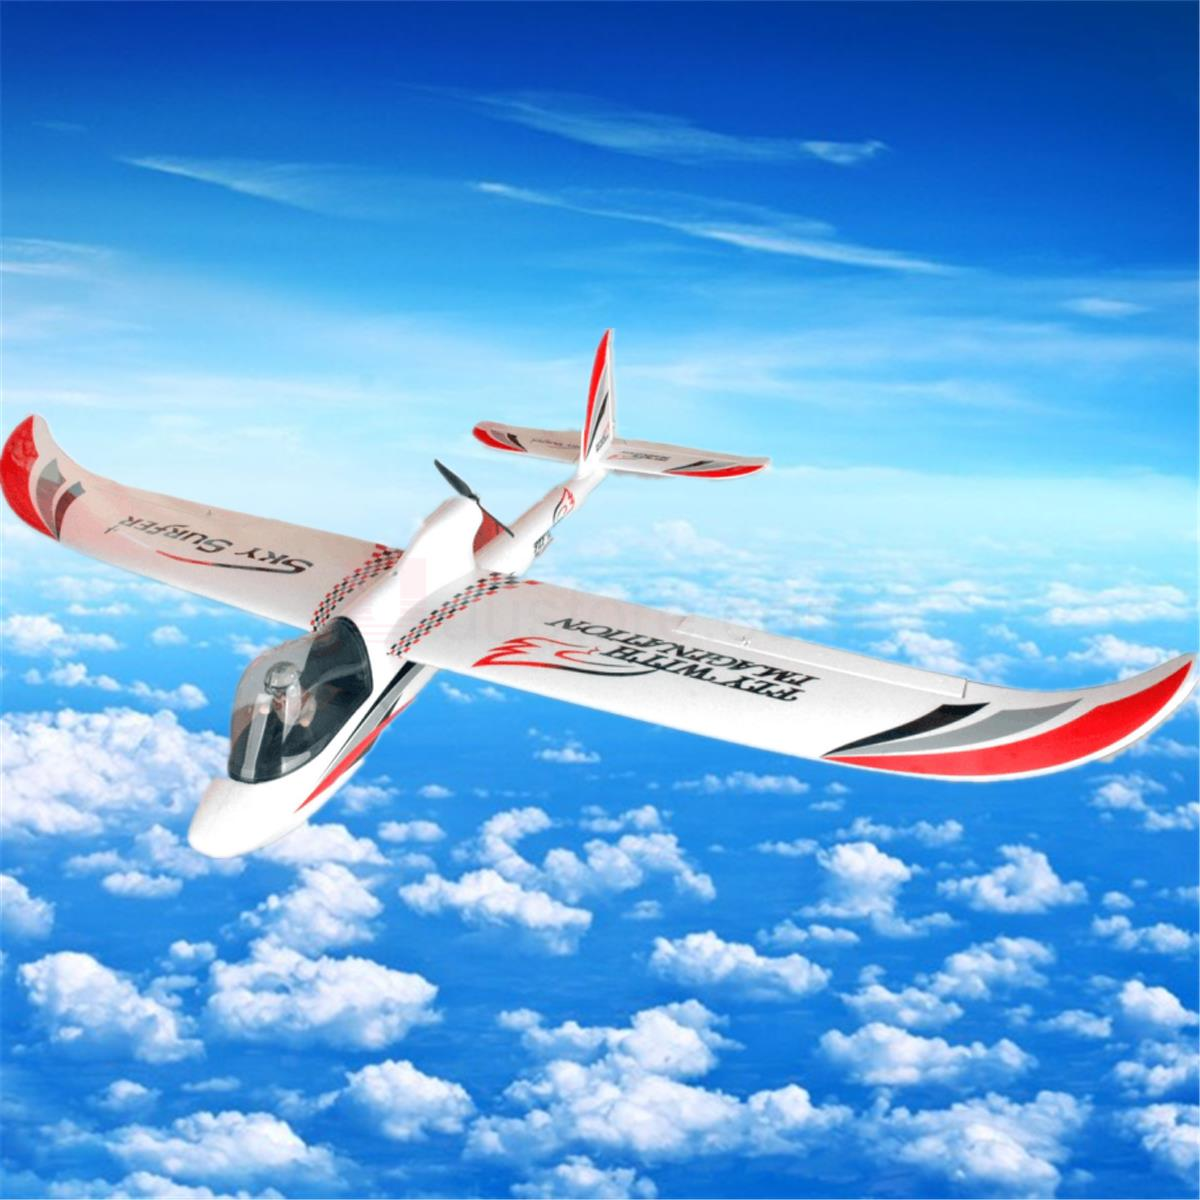 Skysurfer 1500mm wingspan glider plane EPO Kit PNP ARF RC airplane for FPV цена